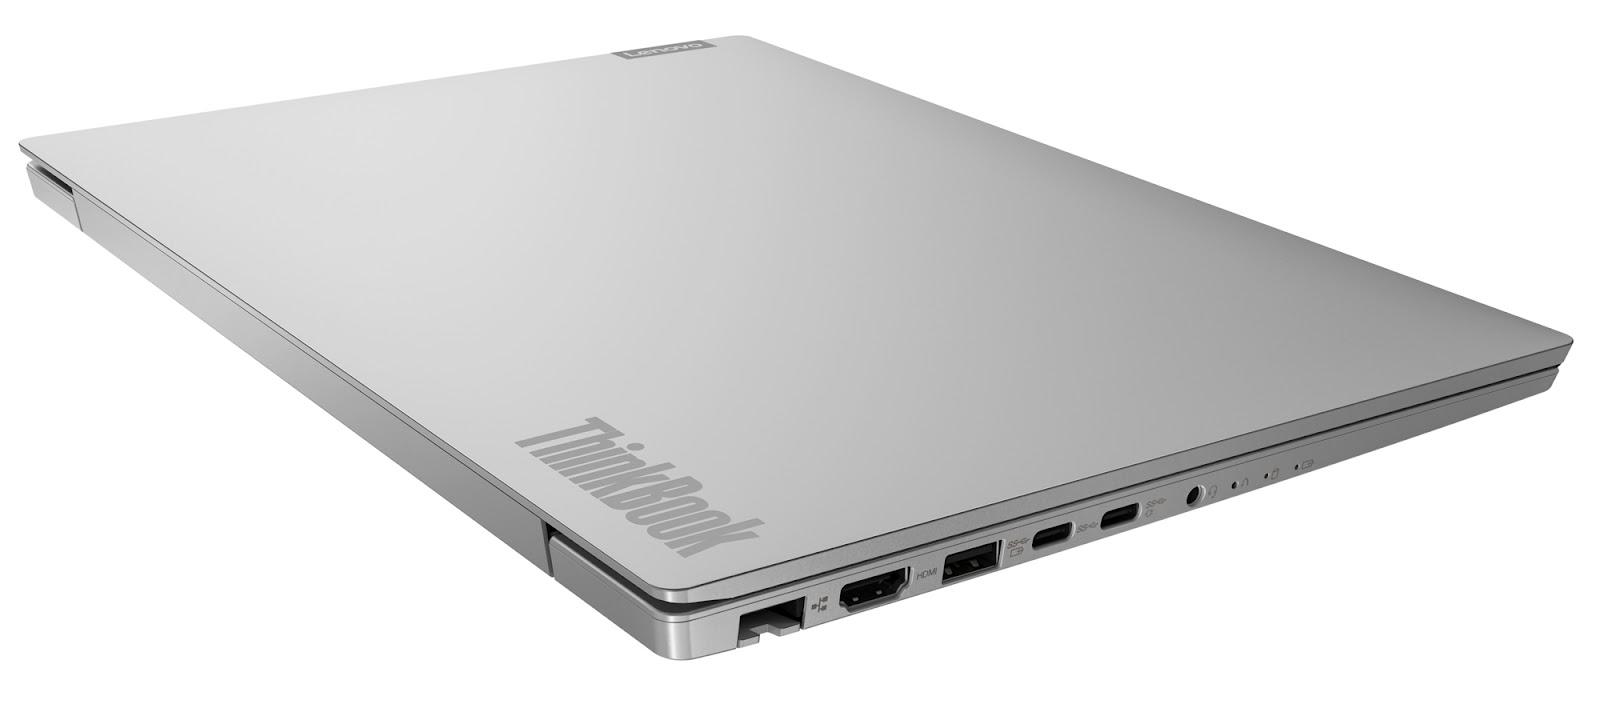 Фото 3. Ноутбук Lenovo ThinkBook 14 IIL (20SL002VRU)